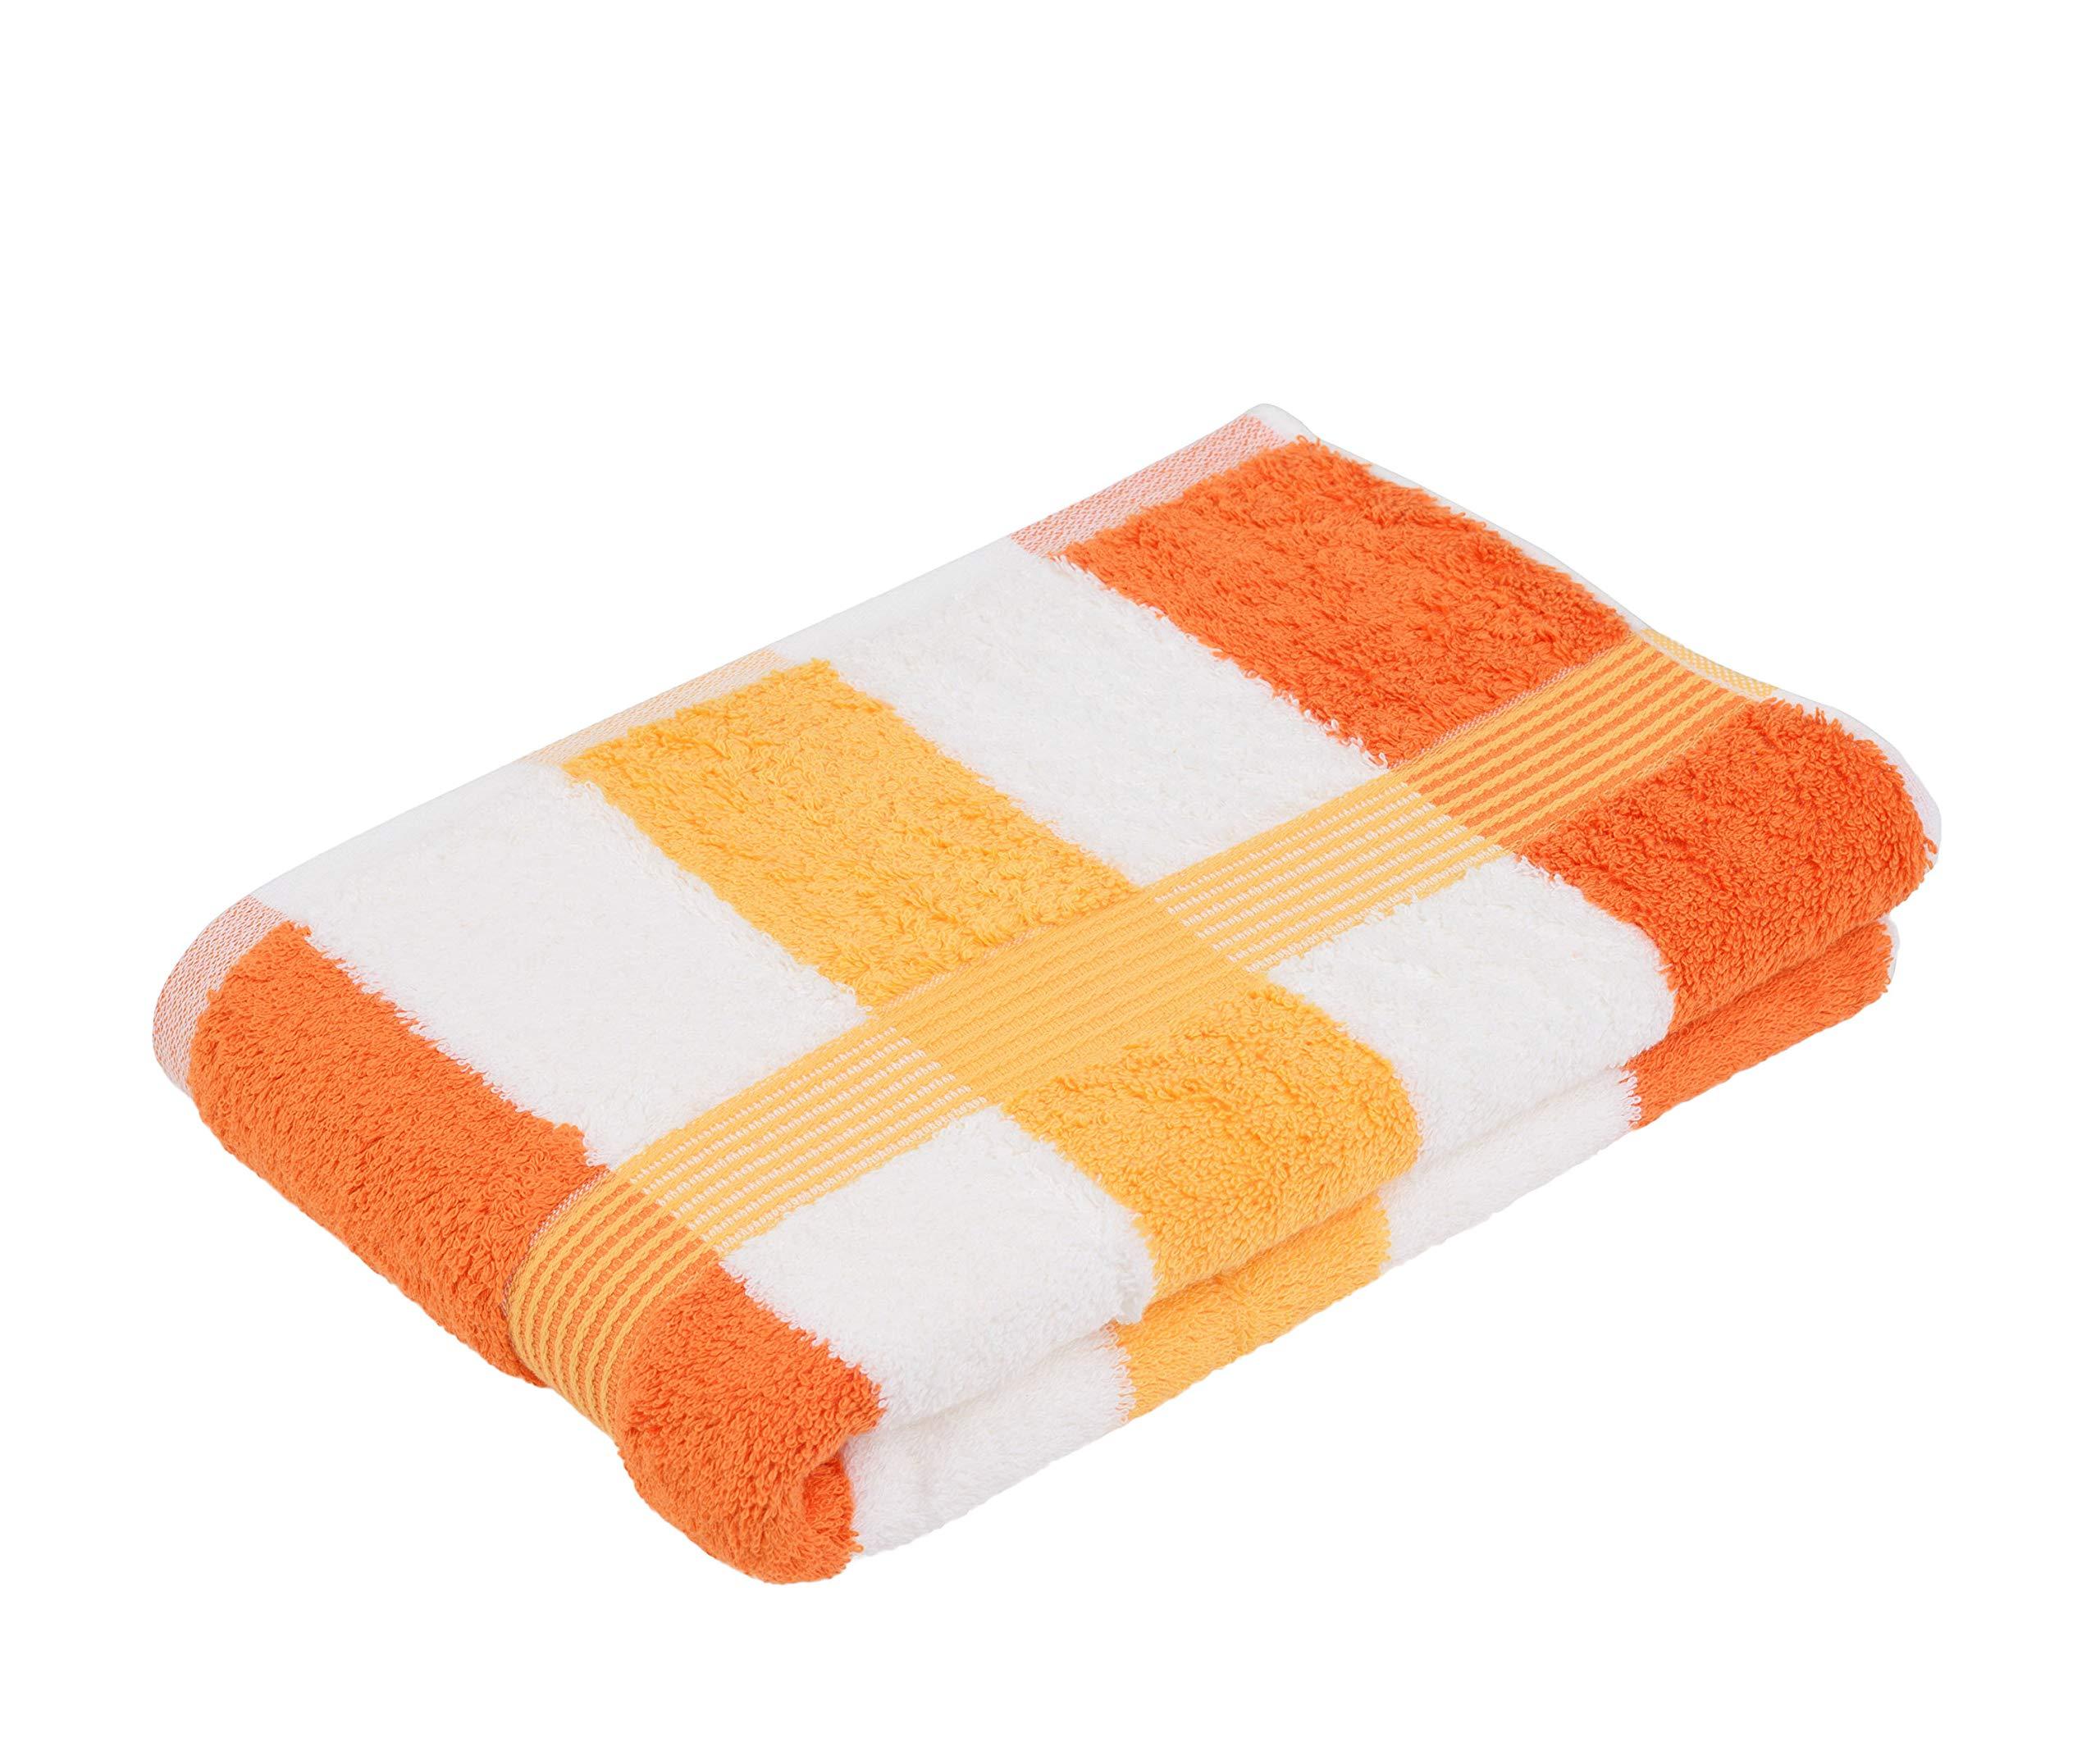 Gözze - Toalla de baño (70 x 140 cm, 100% algodón, calidad